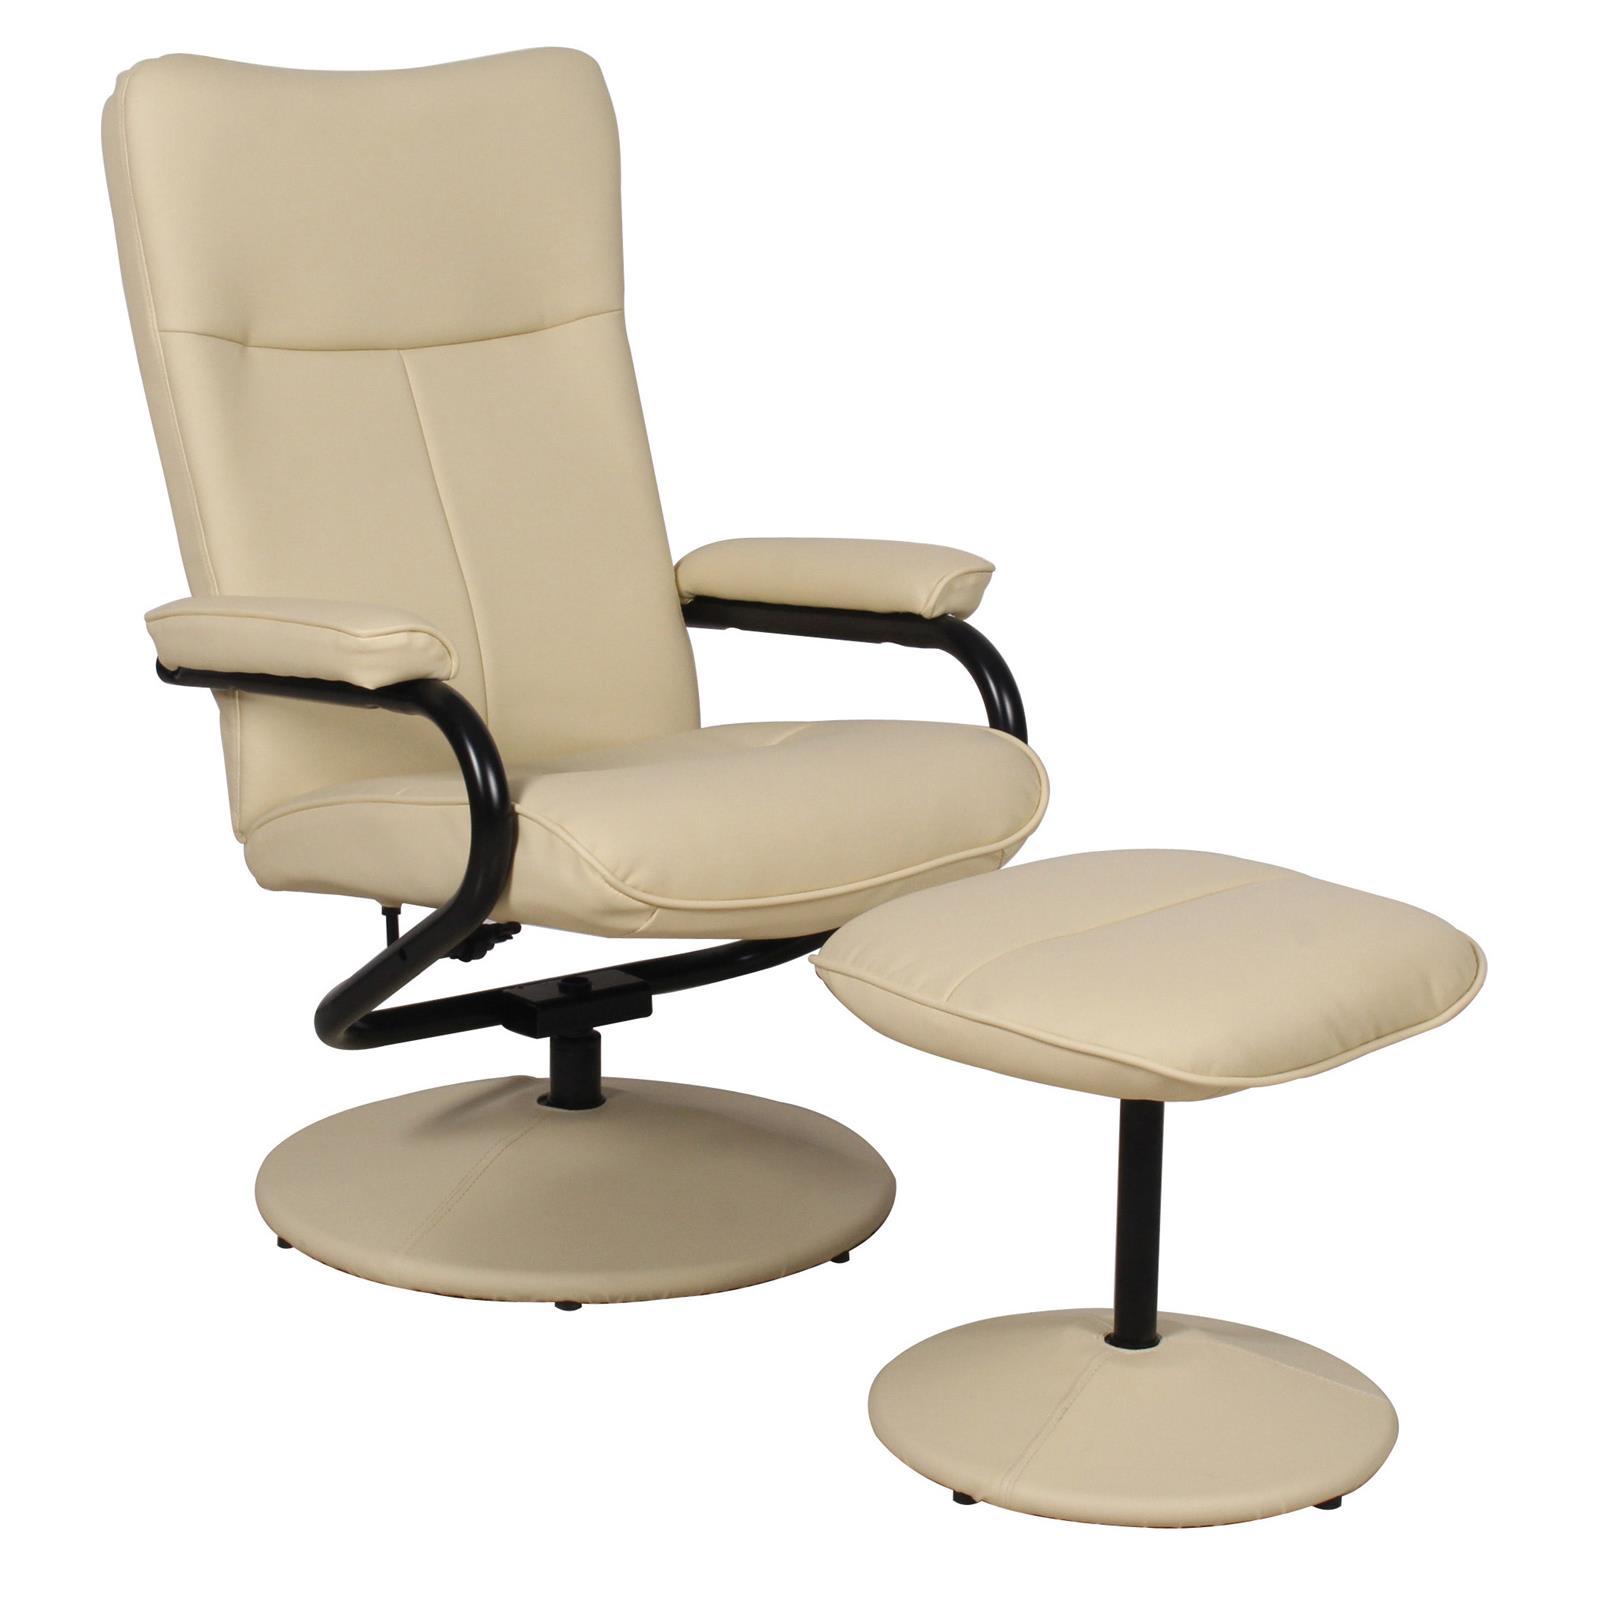 relaxsessel arizona drehbar mit hocker in beige caro m bel. Black Bedroom Furniture Sets. Home Design Ideas